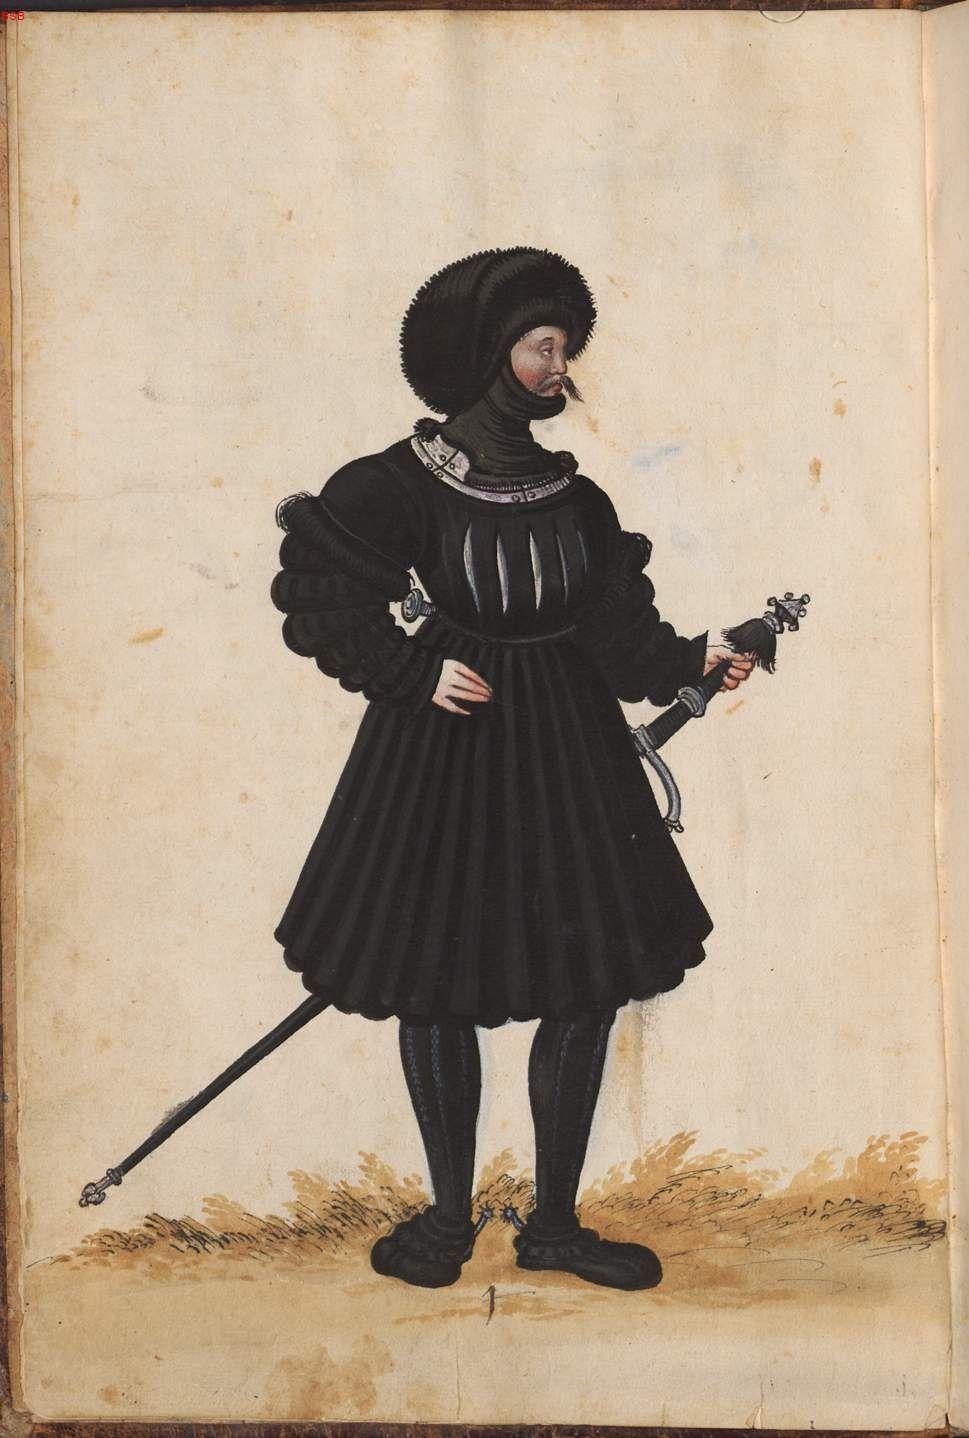 1508 Livery of Dukes of Saxony, from Hofkleiderbuch (Abbildung und Beschreibung der Hof-Livreen) des Herzogs Wilhelm IV. und Albrecht V. 1508-1551 - BSB Cgm 1951, München, 16. Jh. [BSB-Hss Cgm 1951]  PUrl- http://daten.digitale-sammlungen.de/bsb00016005/image_8